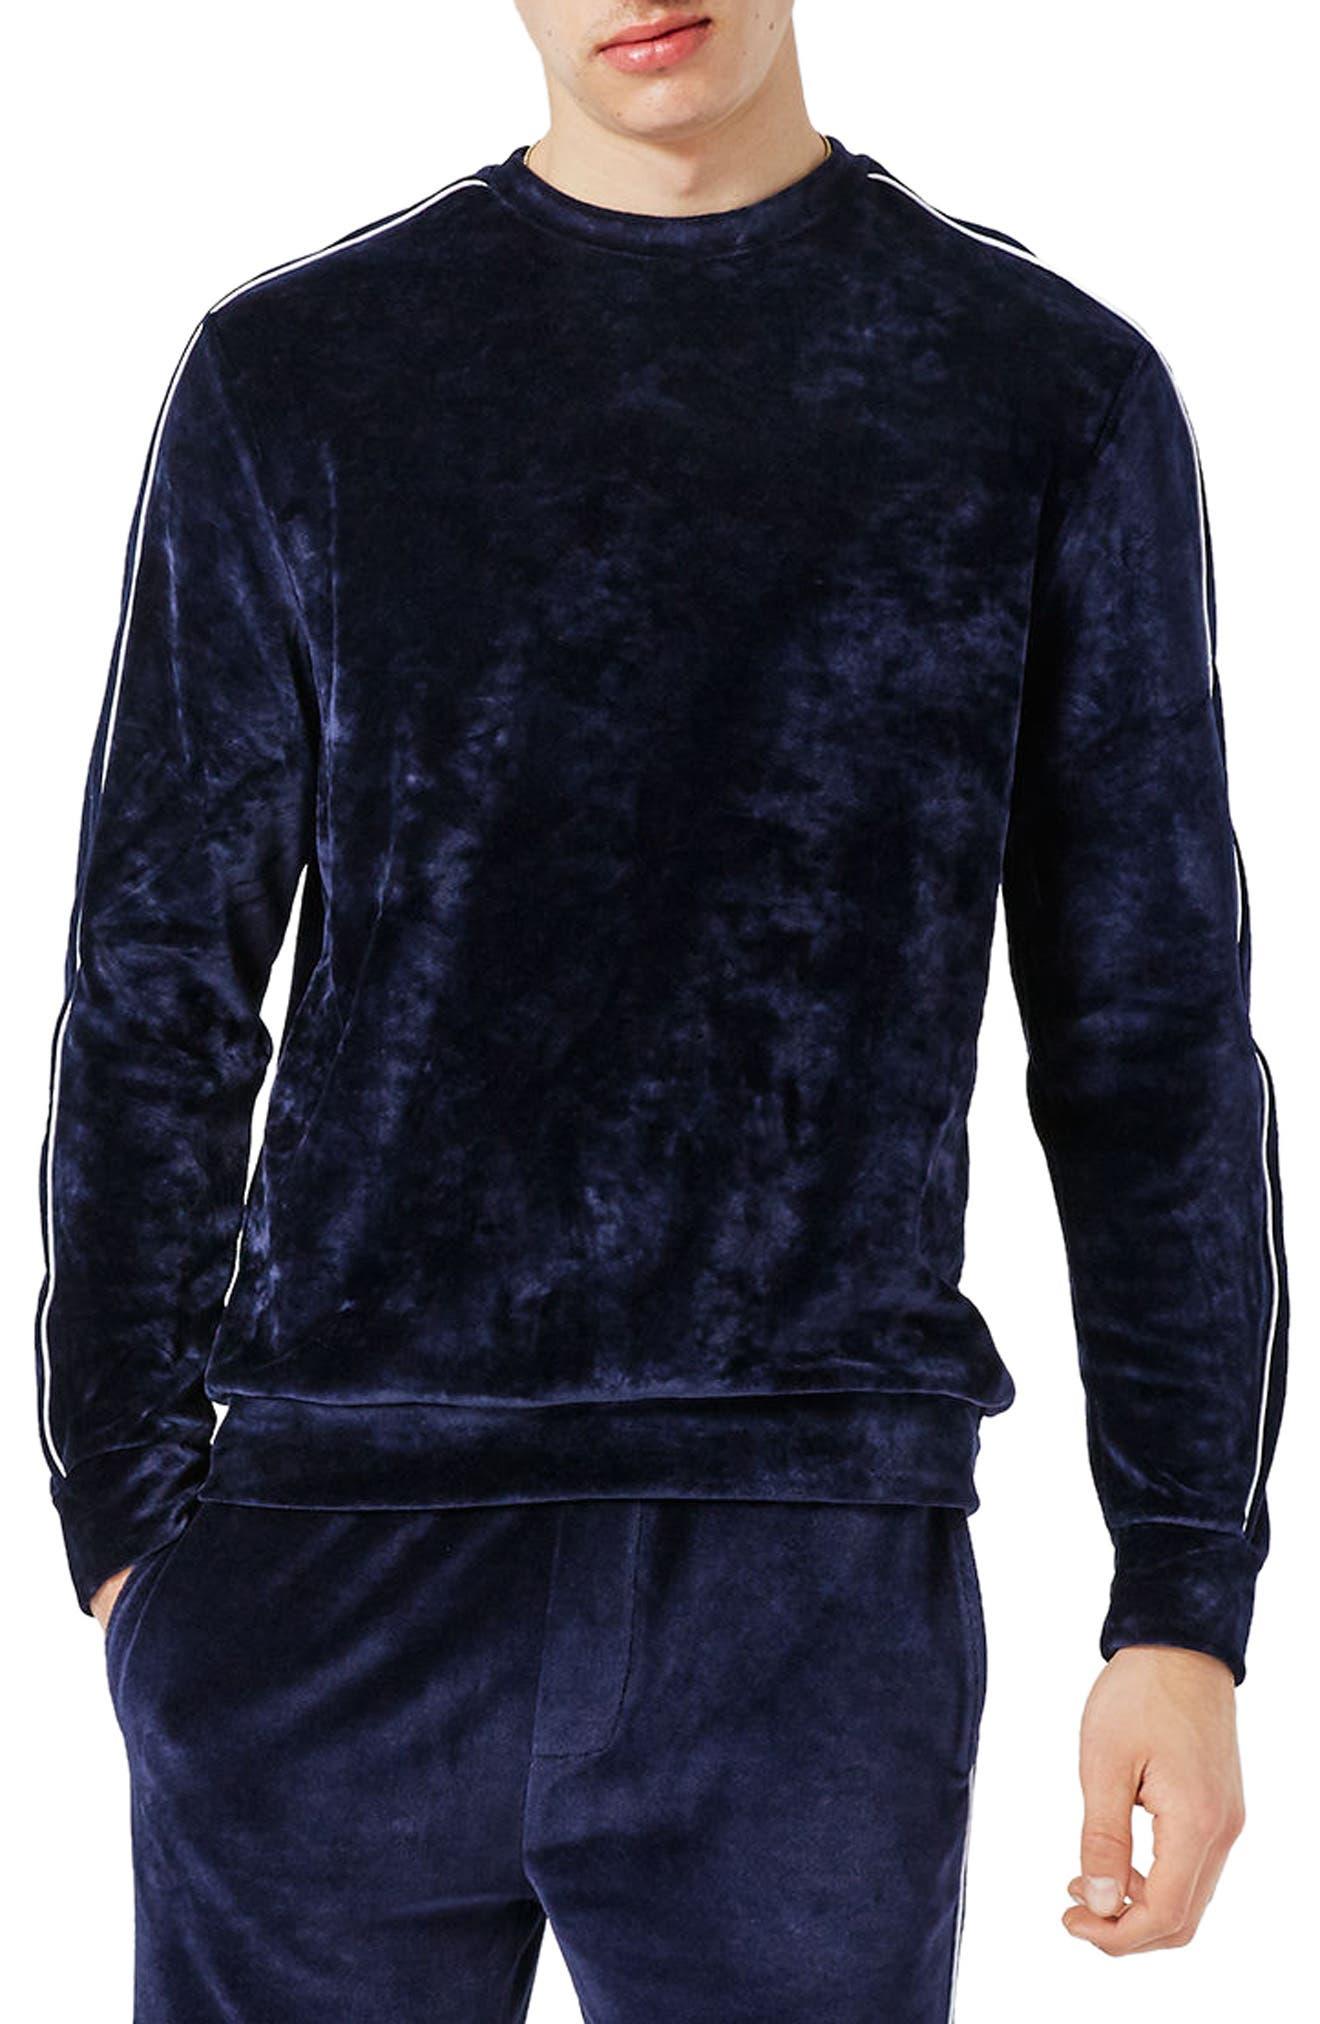 Topman Piped Velour Sweatshirt